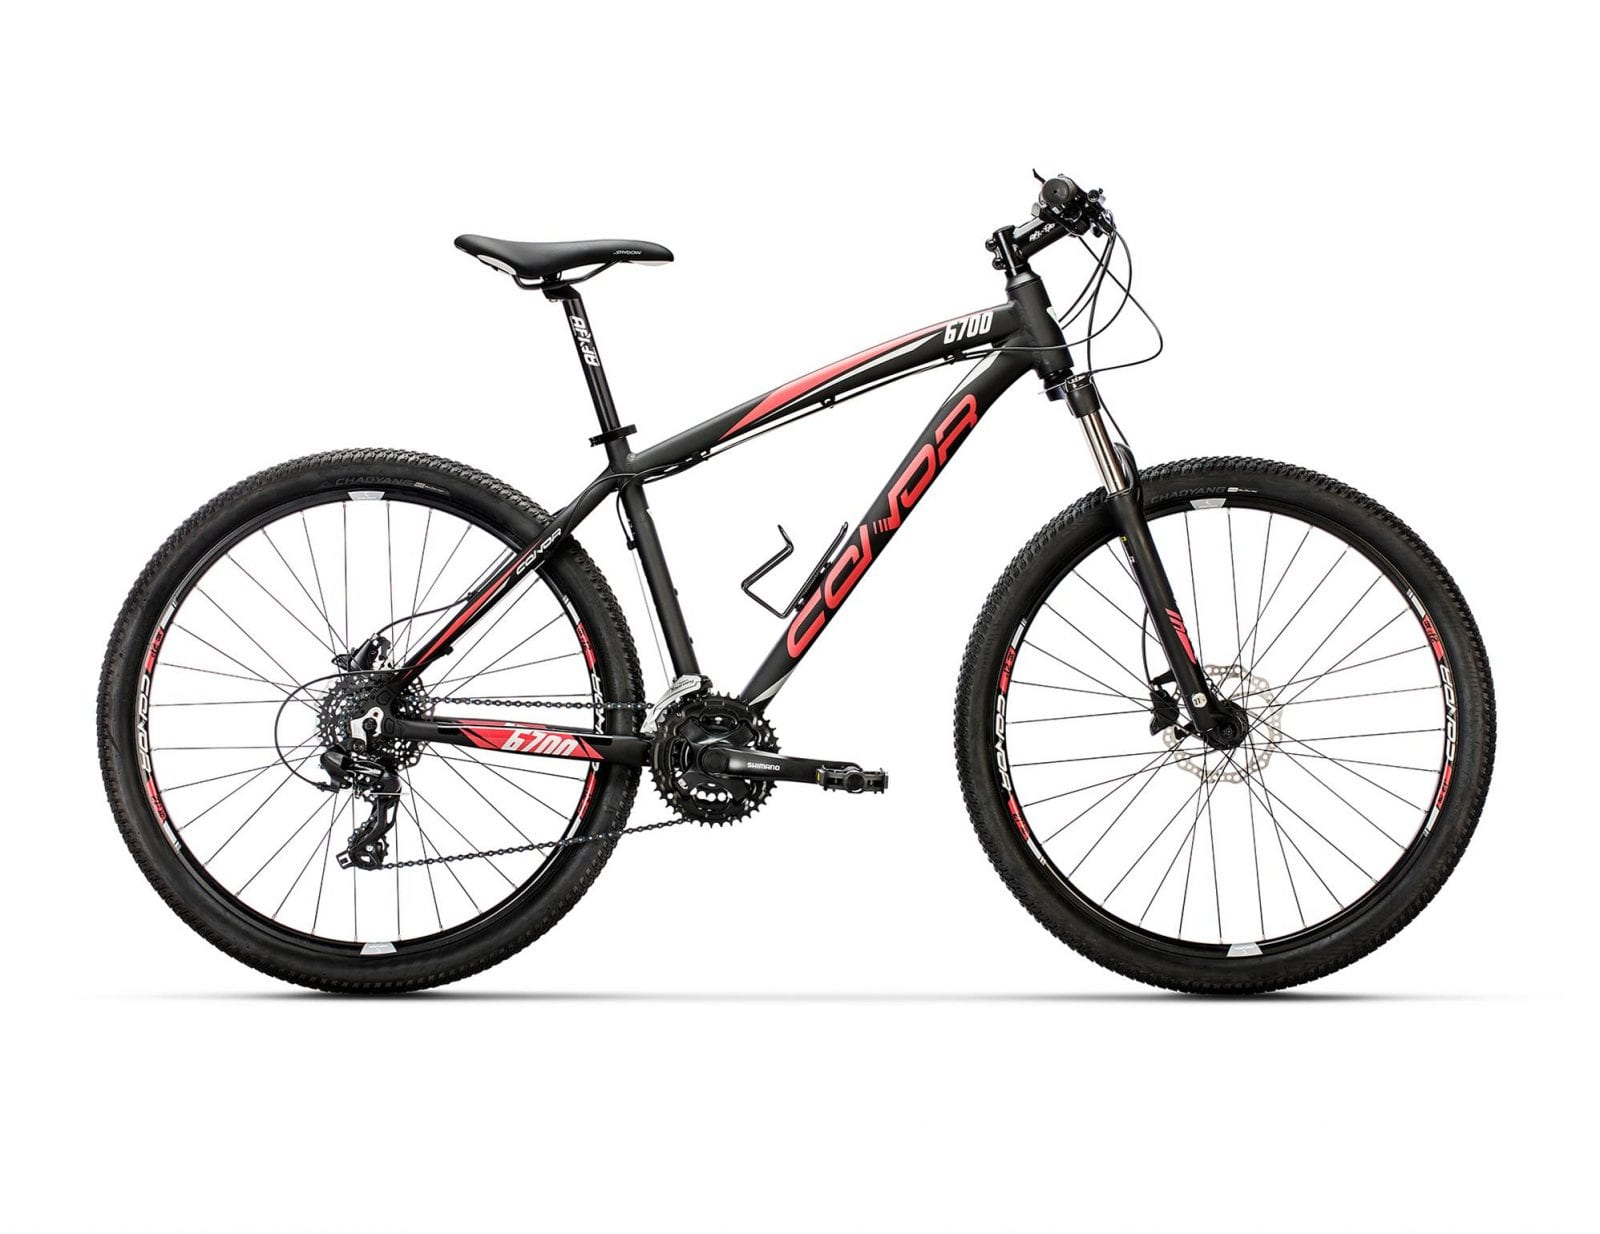 Conor-6700-27,5-Roja-Vuk-Bikes-Madrid